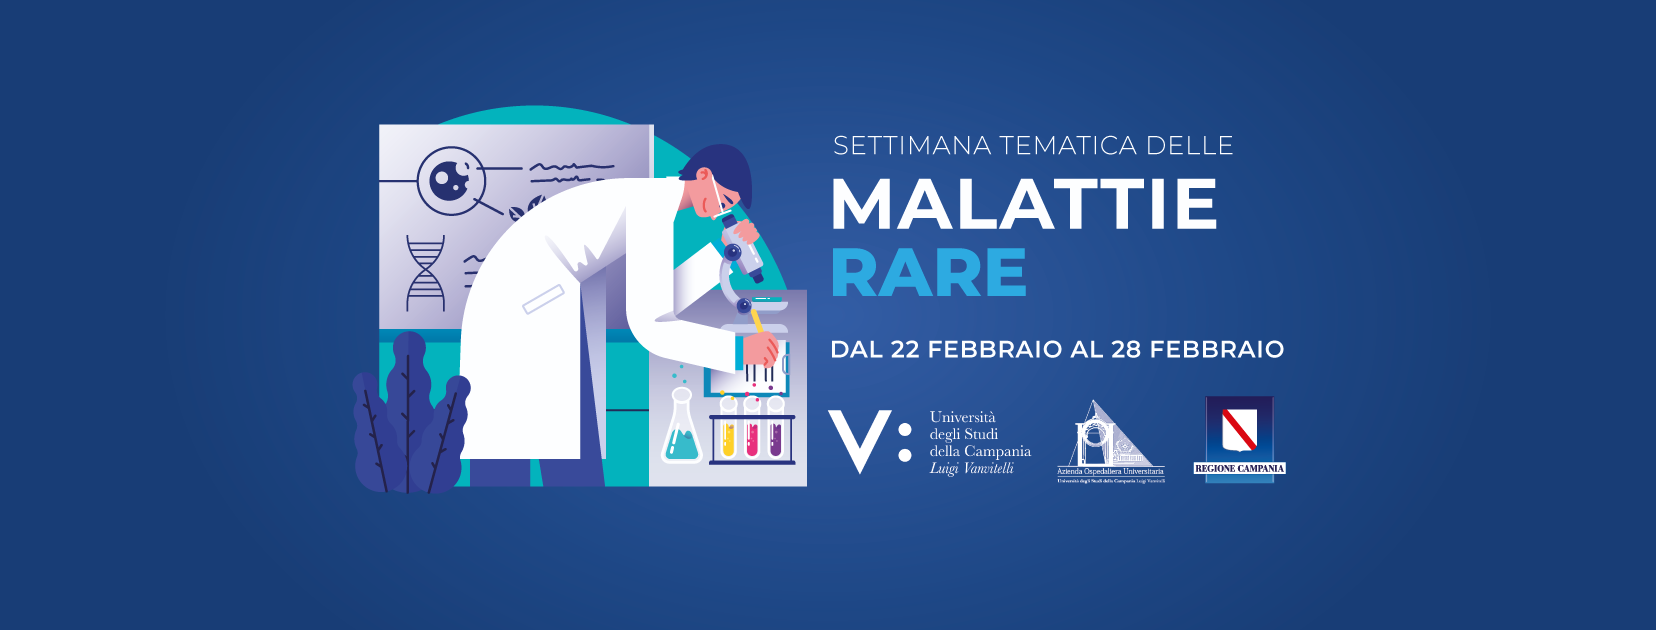 "Malattie rare: al via la campagna informativa del Policlinico ""Luigi Vanvitelli"""